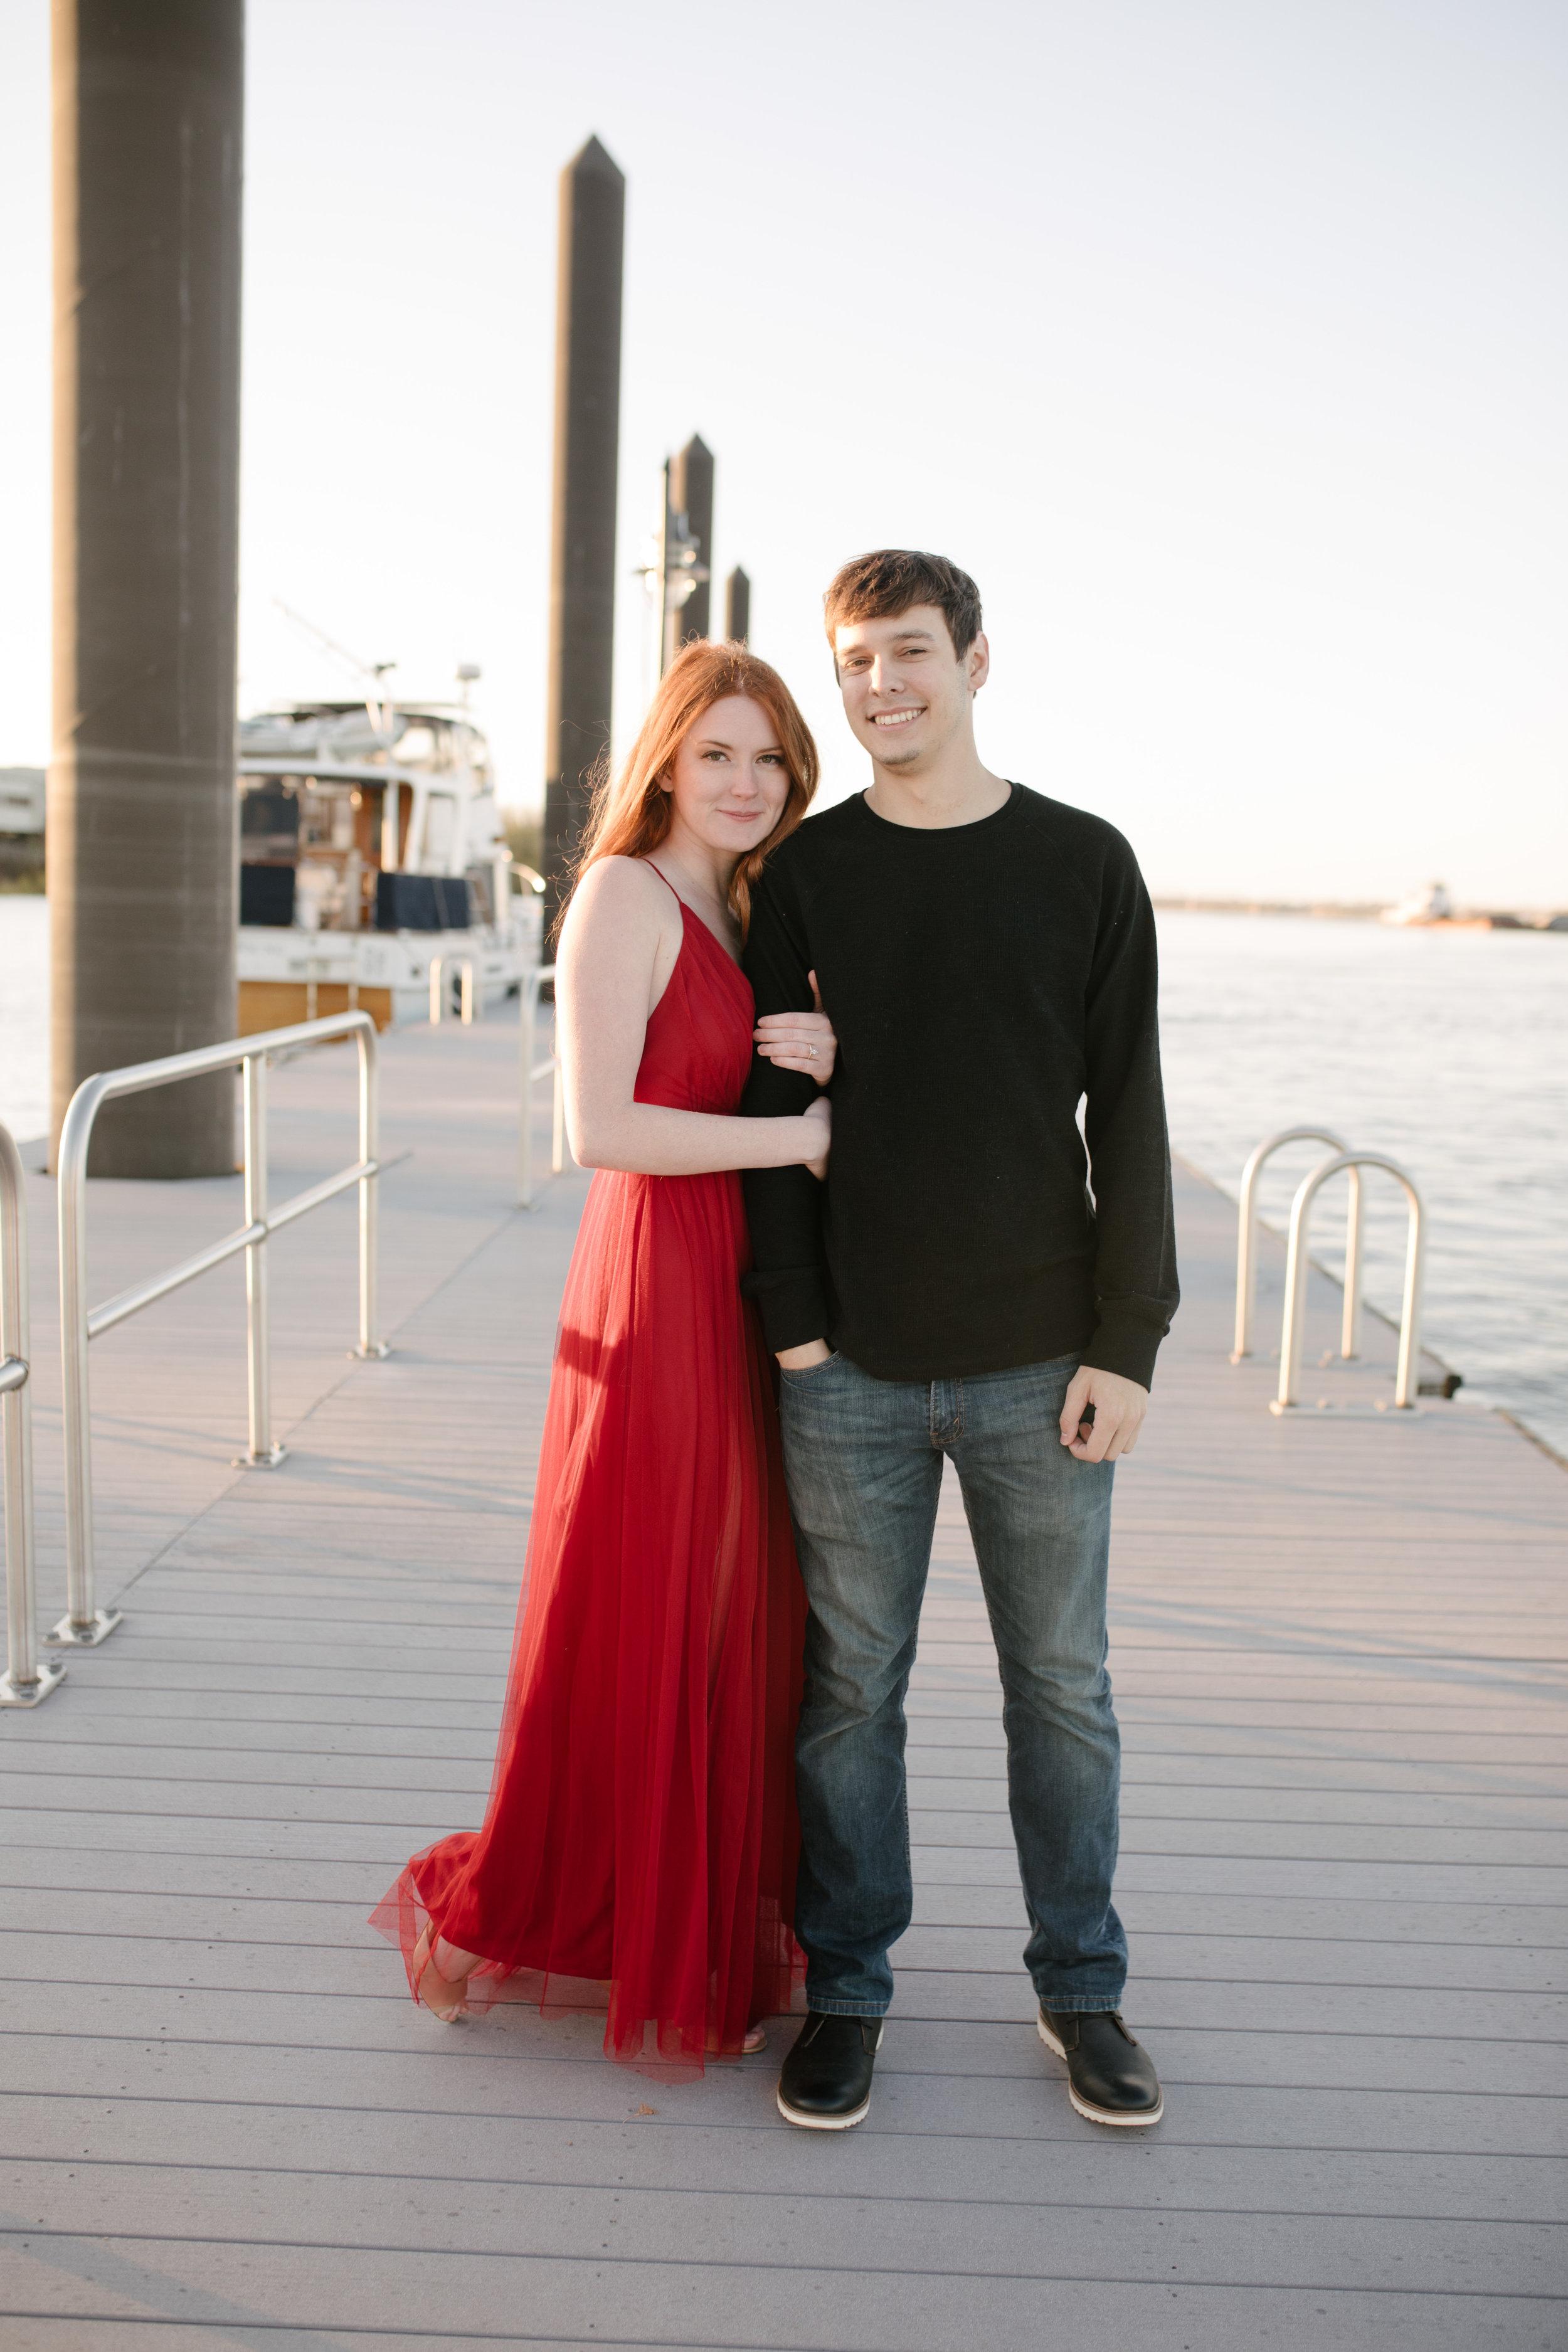 SarahBrookeBrett_Engagement-149.jpg